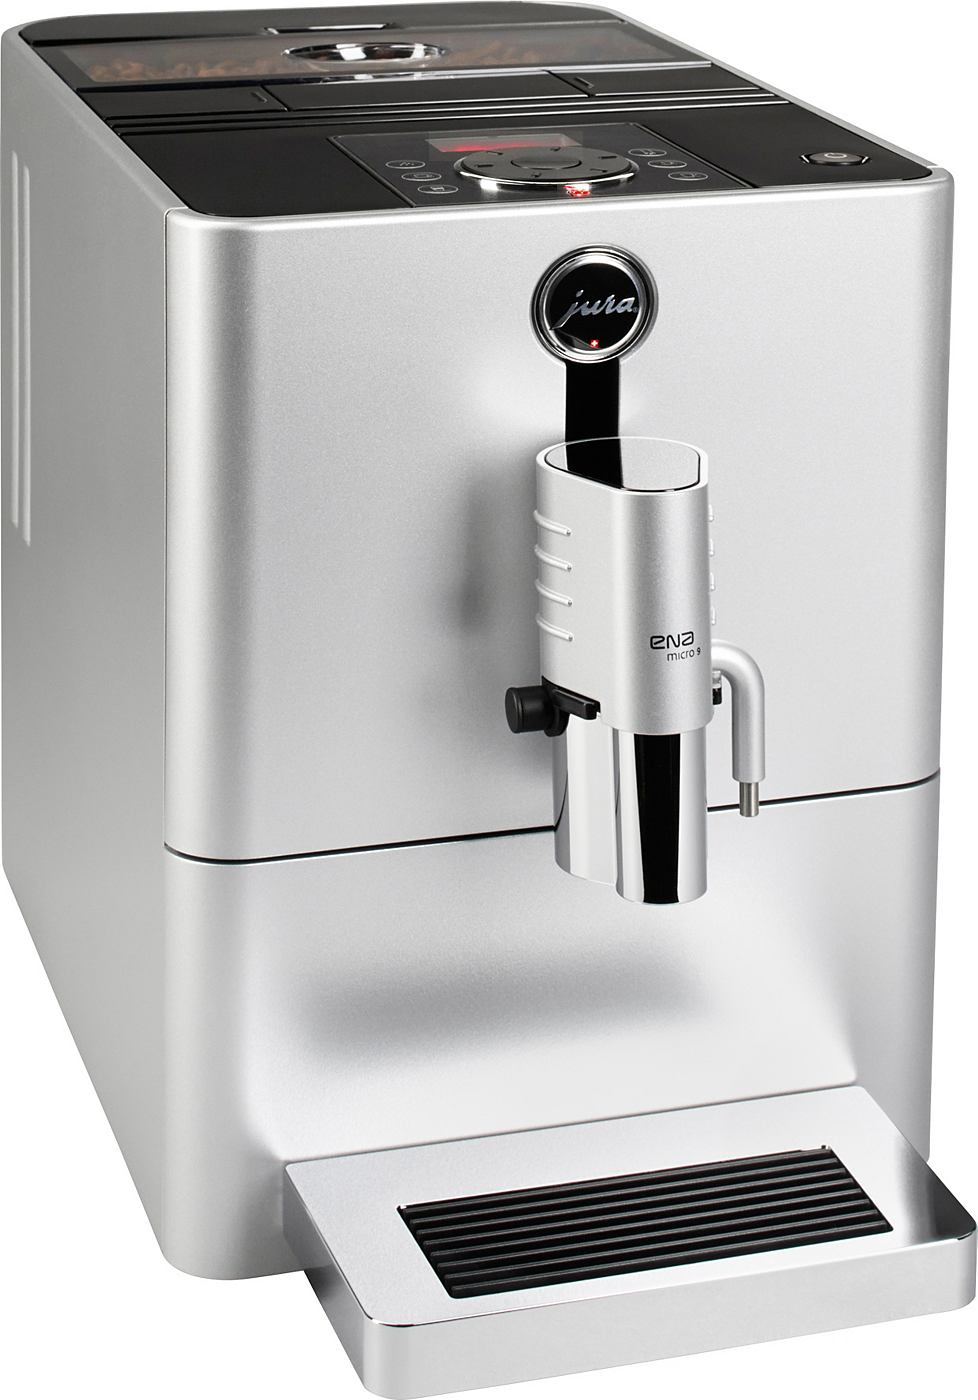 Jura Kaffeevollautomat »13691 ENA Micro 9 One Touch«